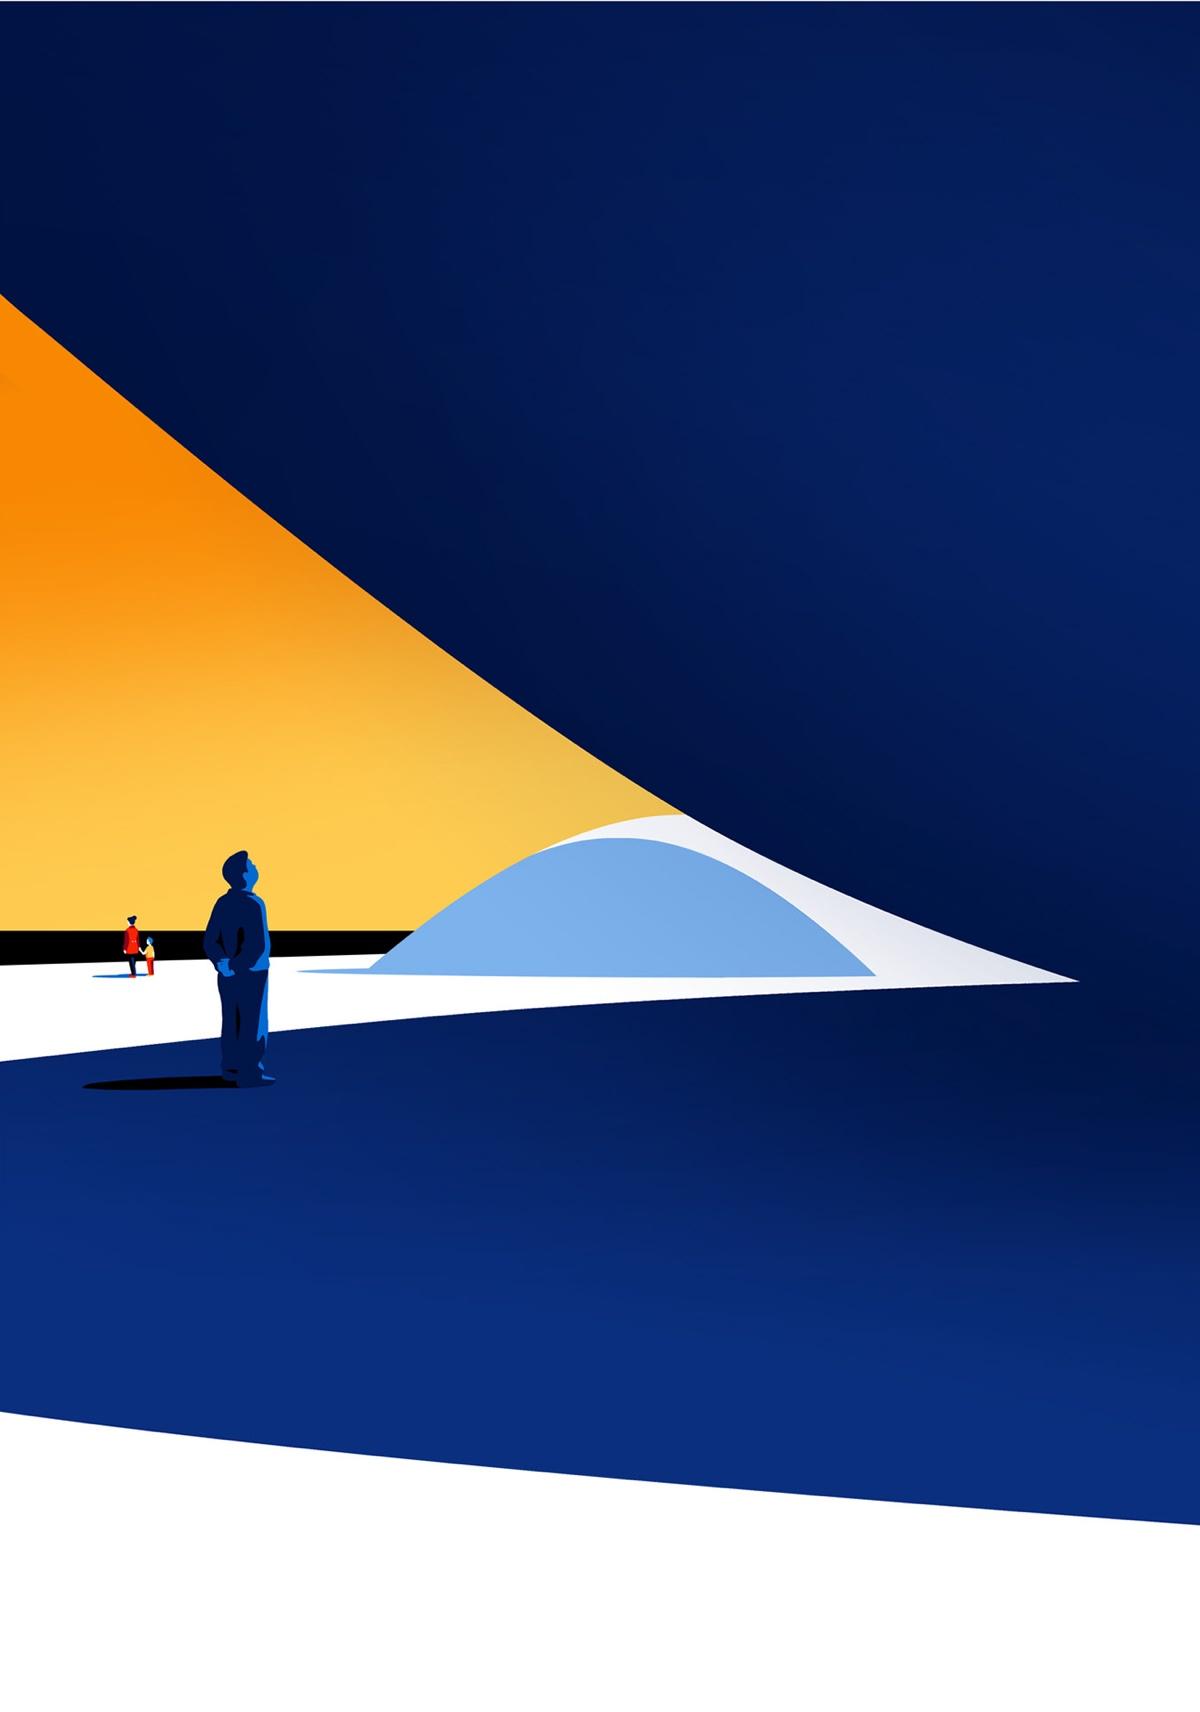 oscar-niemeyer-architecture-illustrations-levente-szabo-1